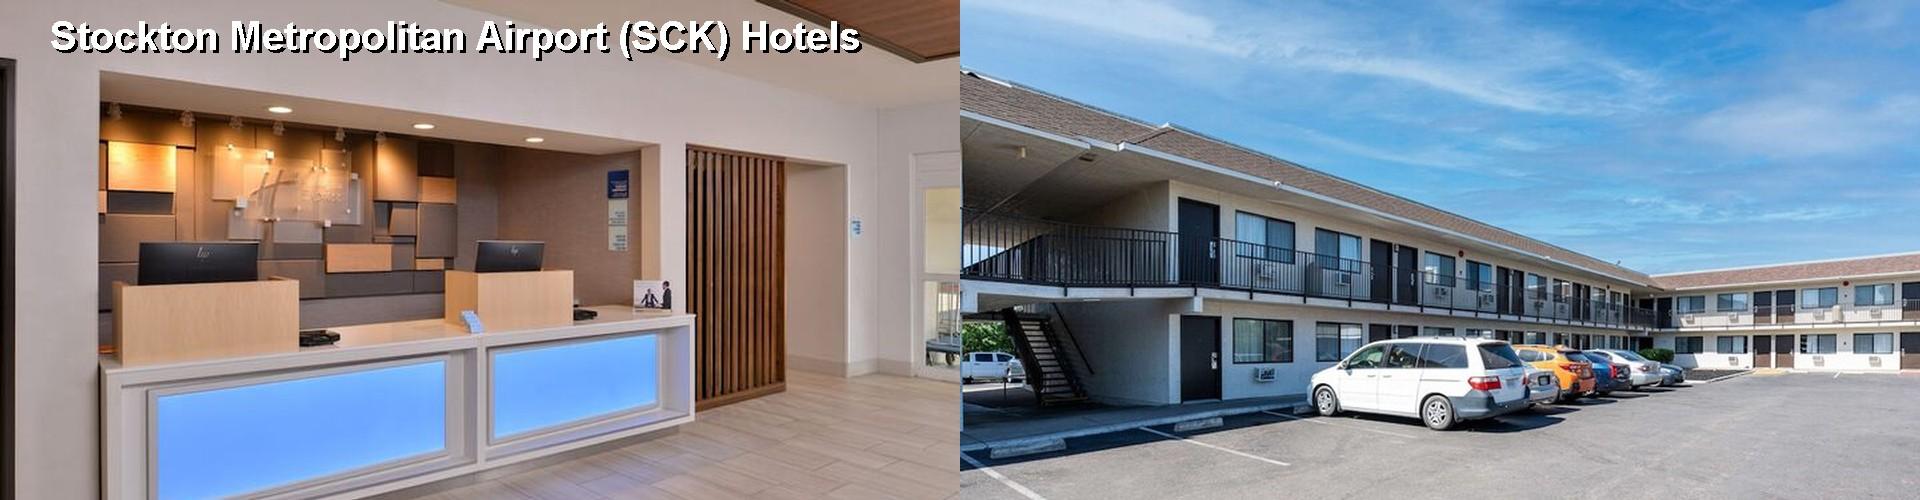 81ba3296d1 $47+ FINEST Hotels Near Stockton Metropolitan Airport (SCK) CA ✈